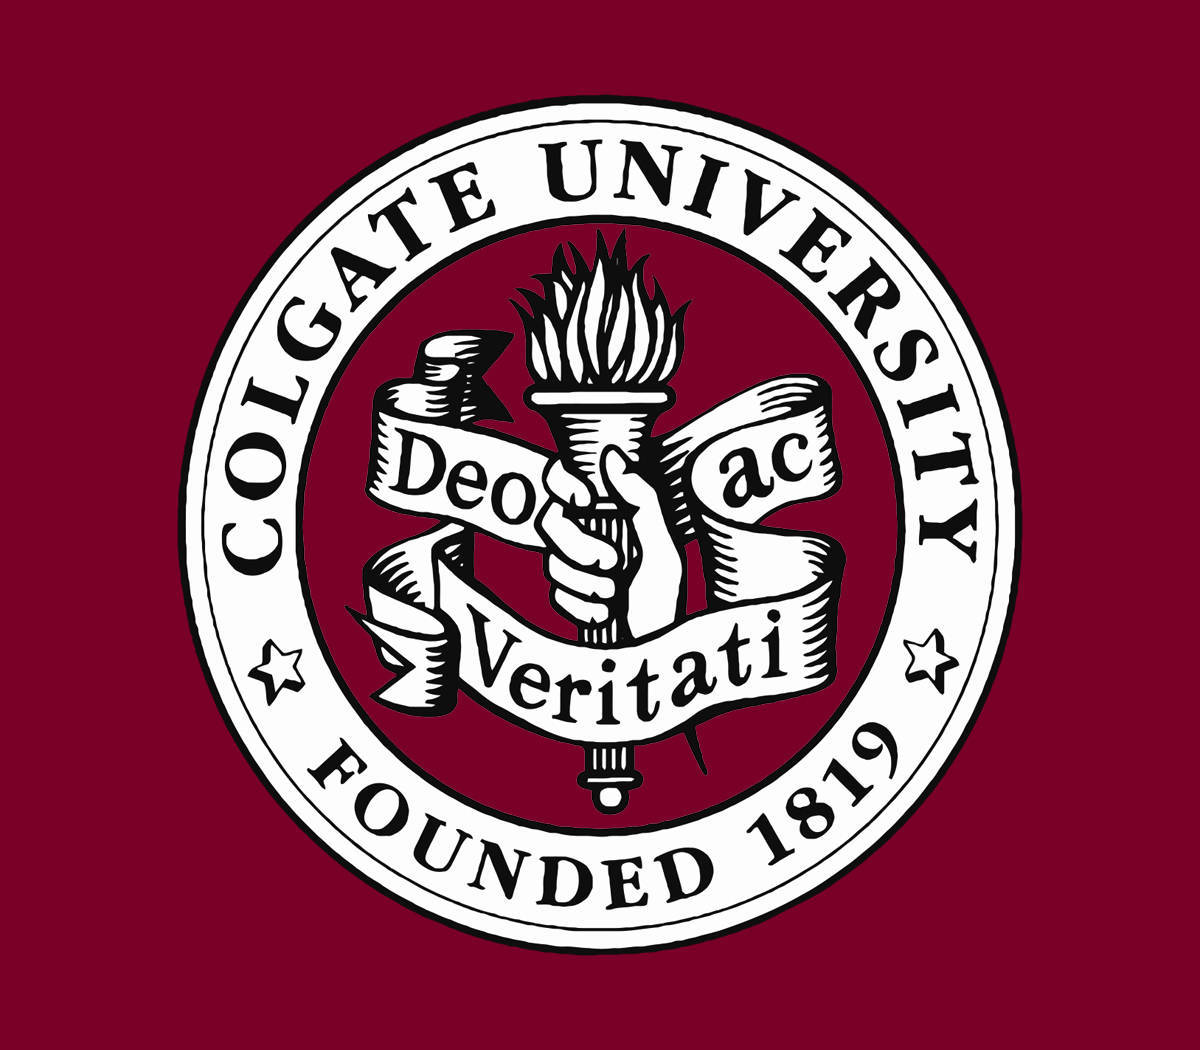 91f8bd535e274908f6eb_Colgate_University.jpg